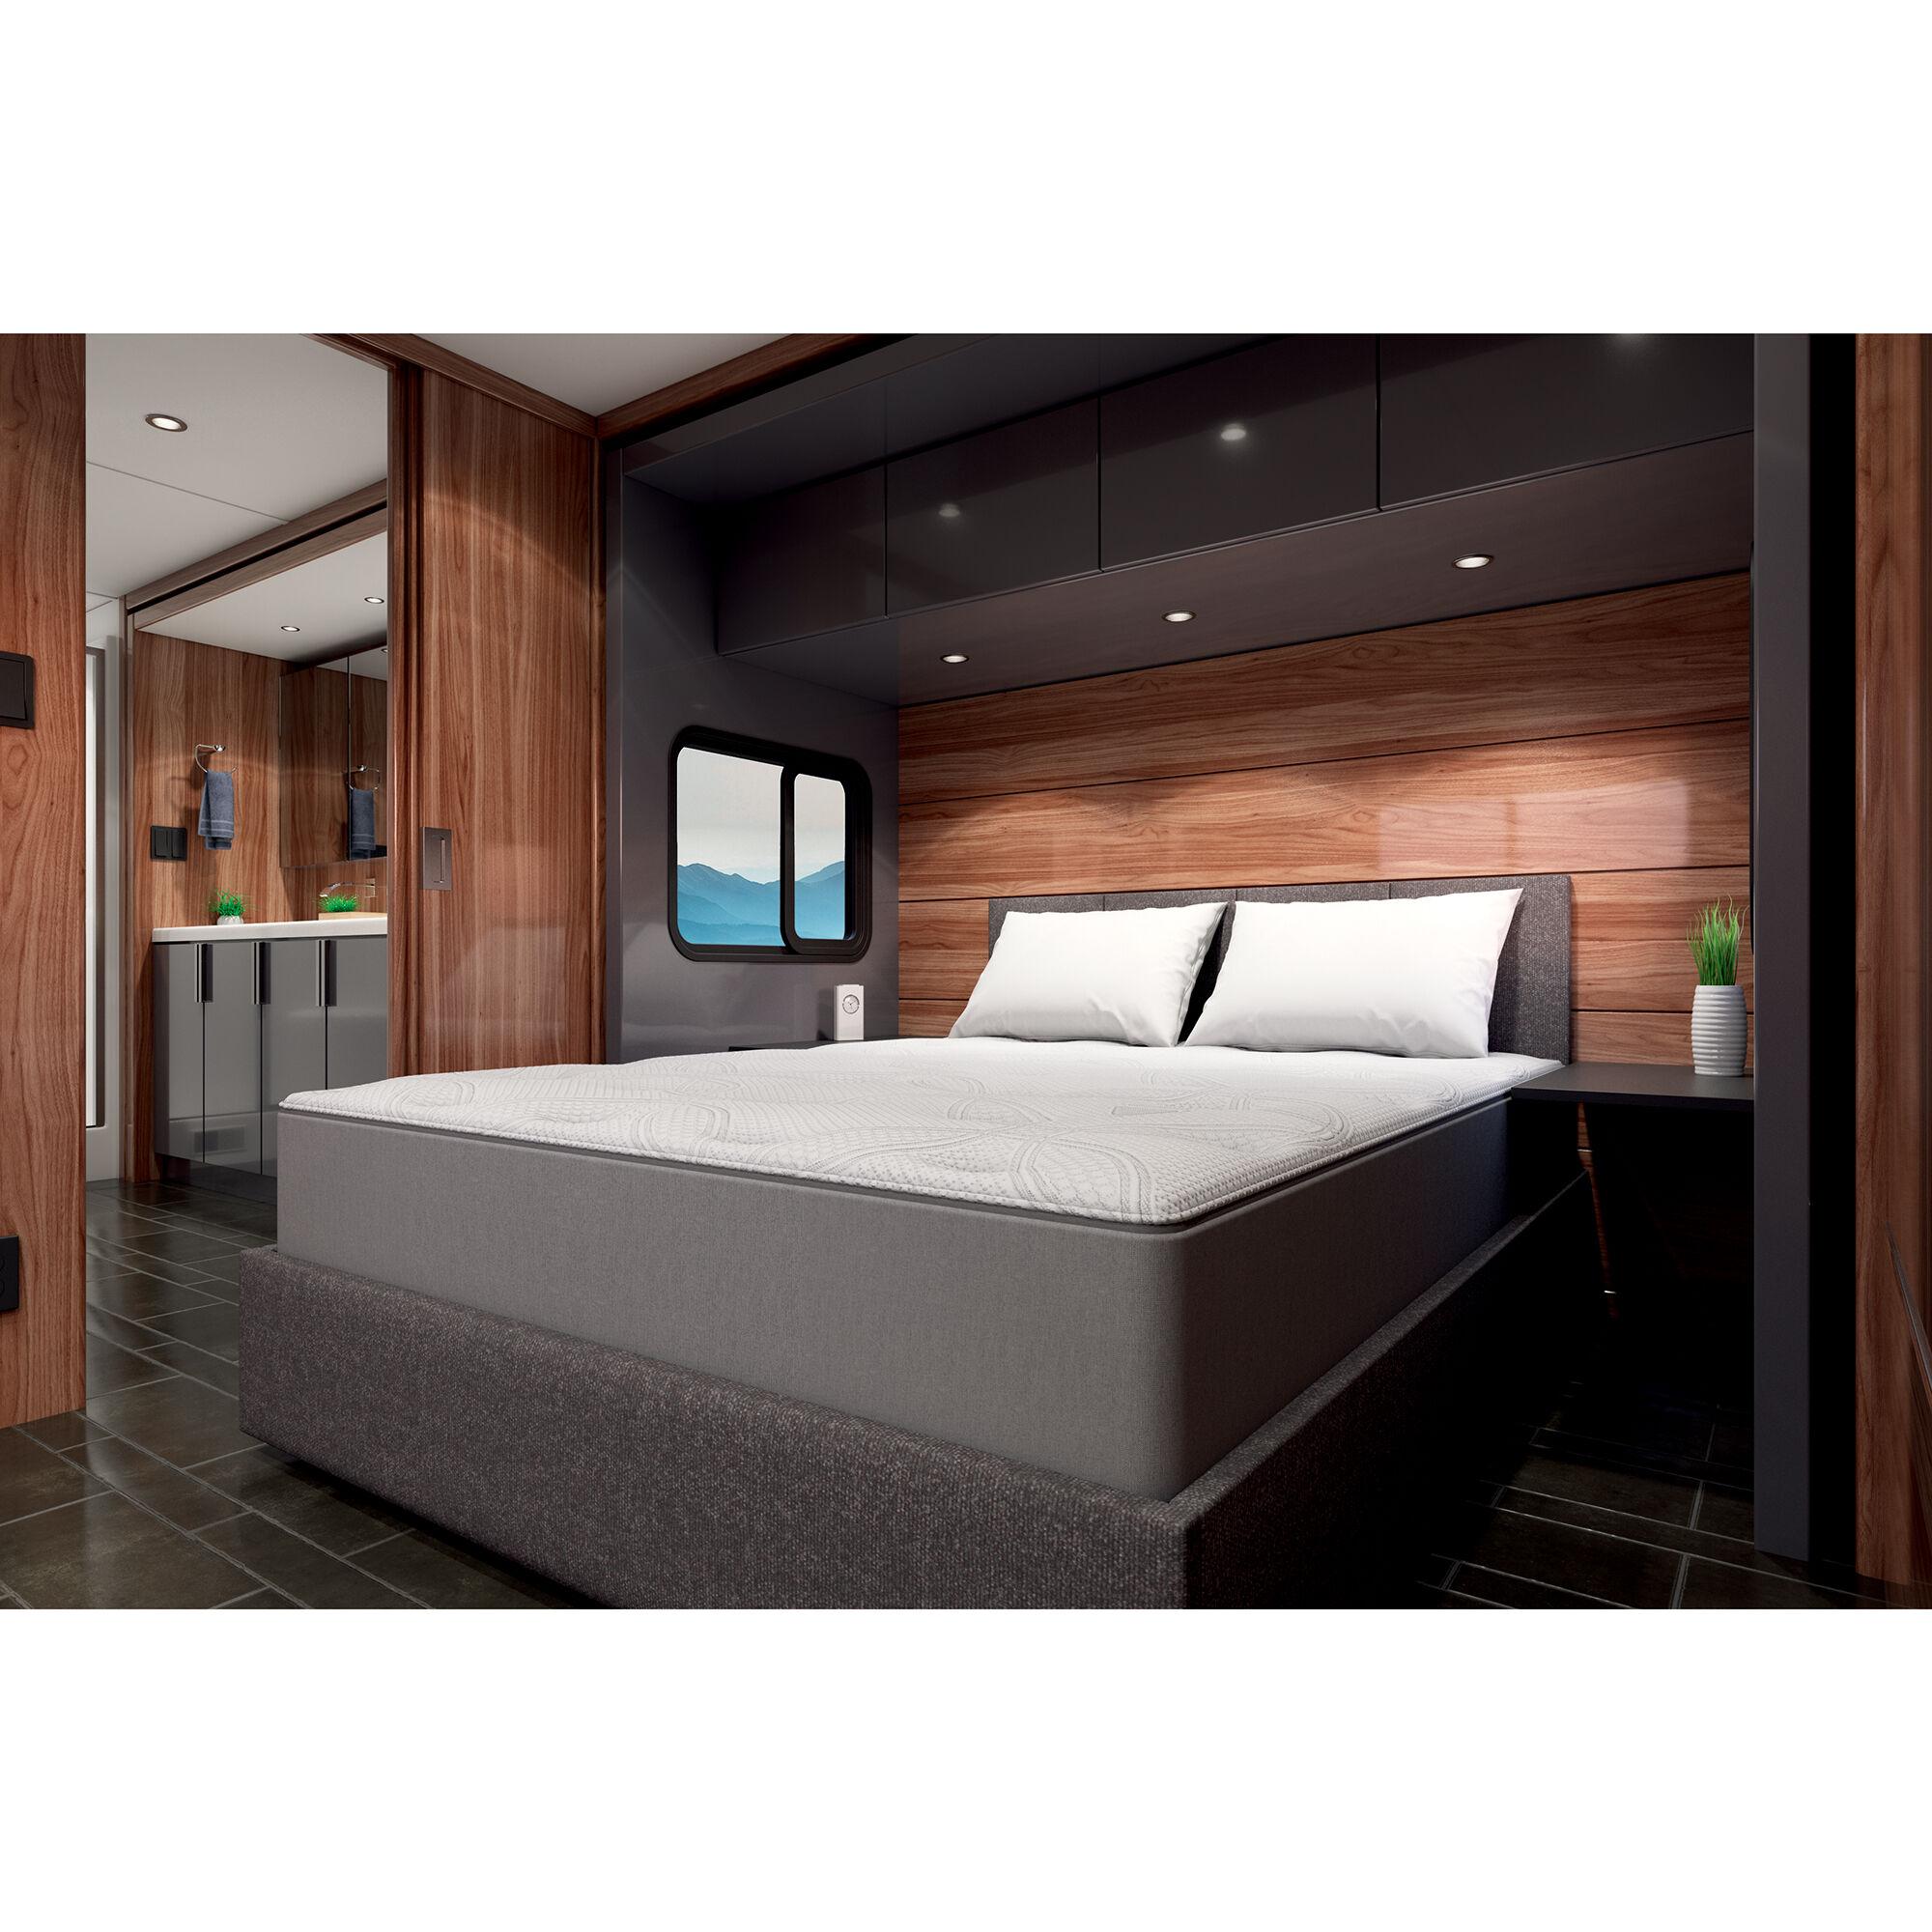 Sleep Number r5 Mattress RV King | Camping World